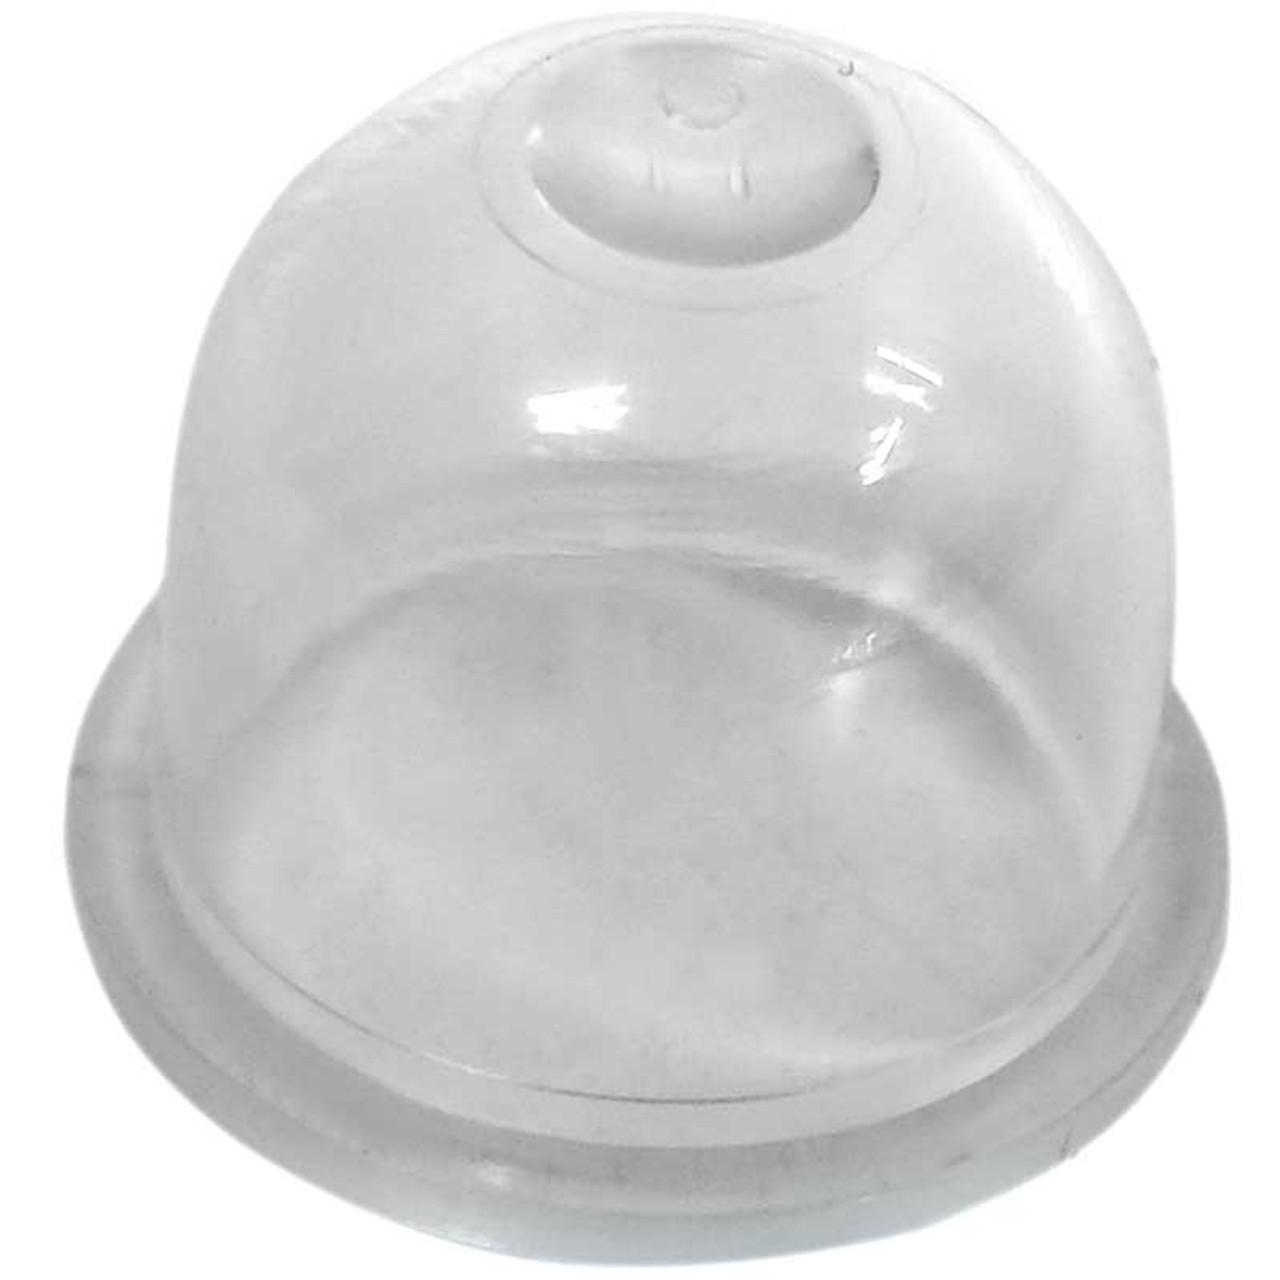 OEM Walbro 188-12-1 Primer Bulb